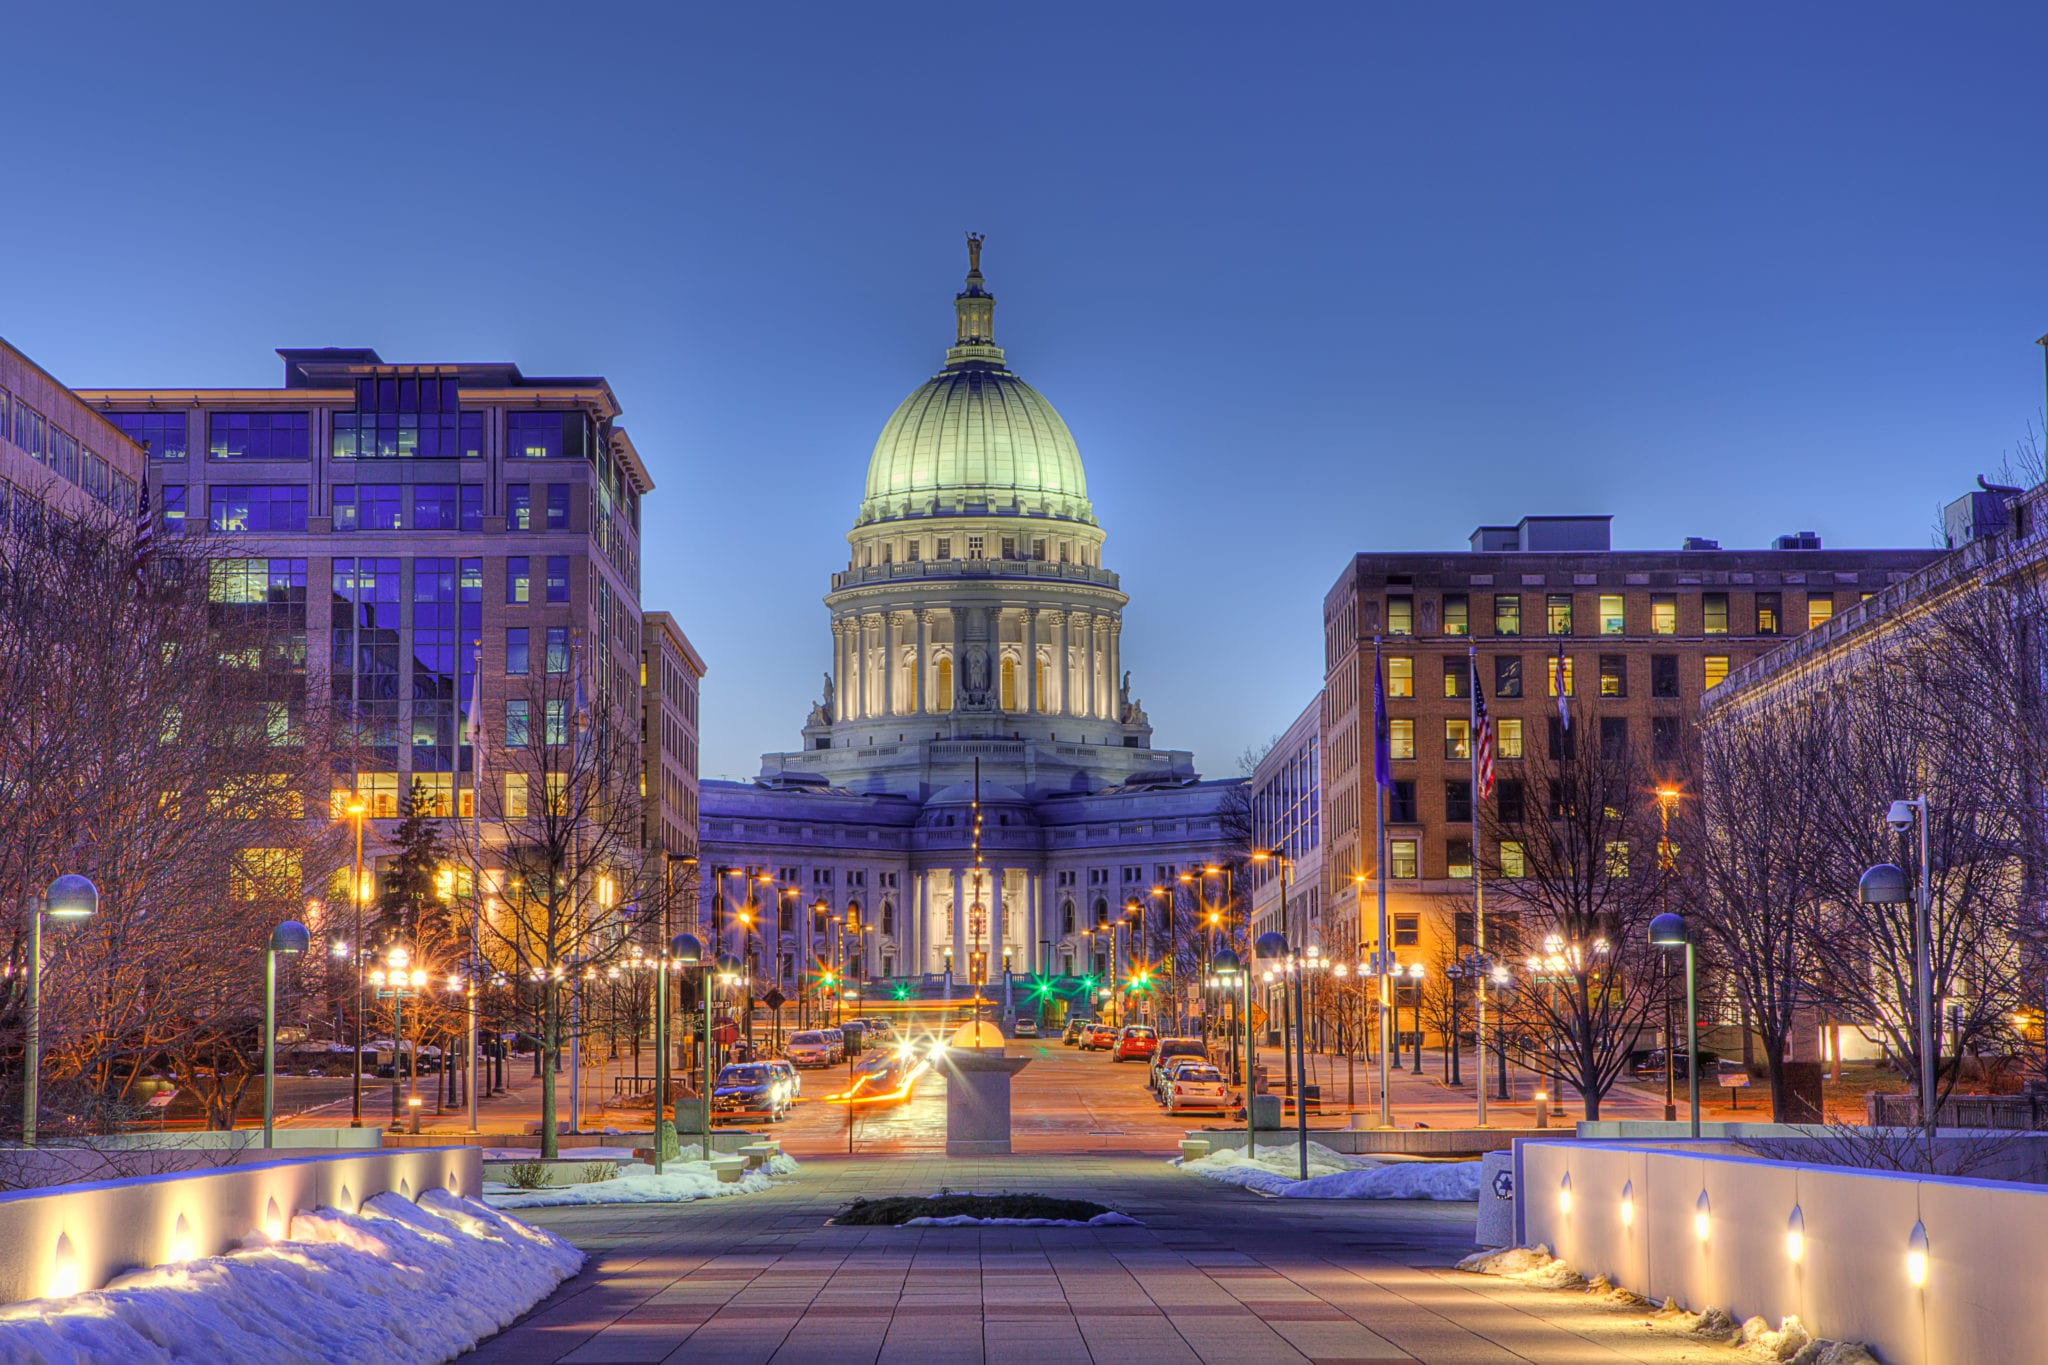 Wisconsin Lawmakers' Bipartisan Medical Pot Bill Faces Hurdles